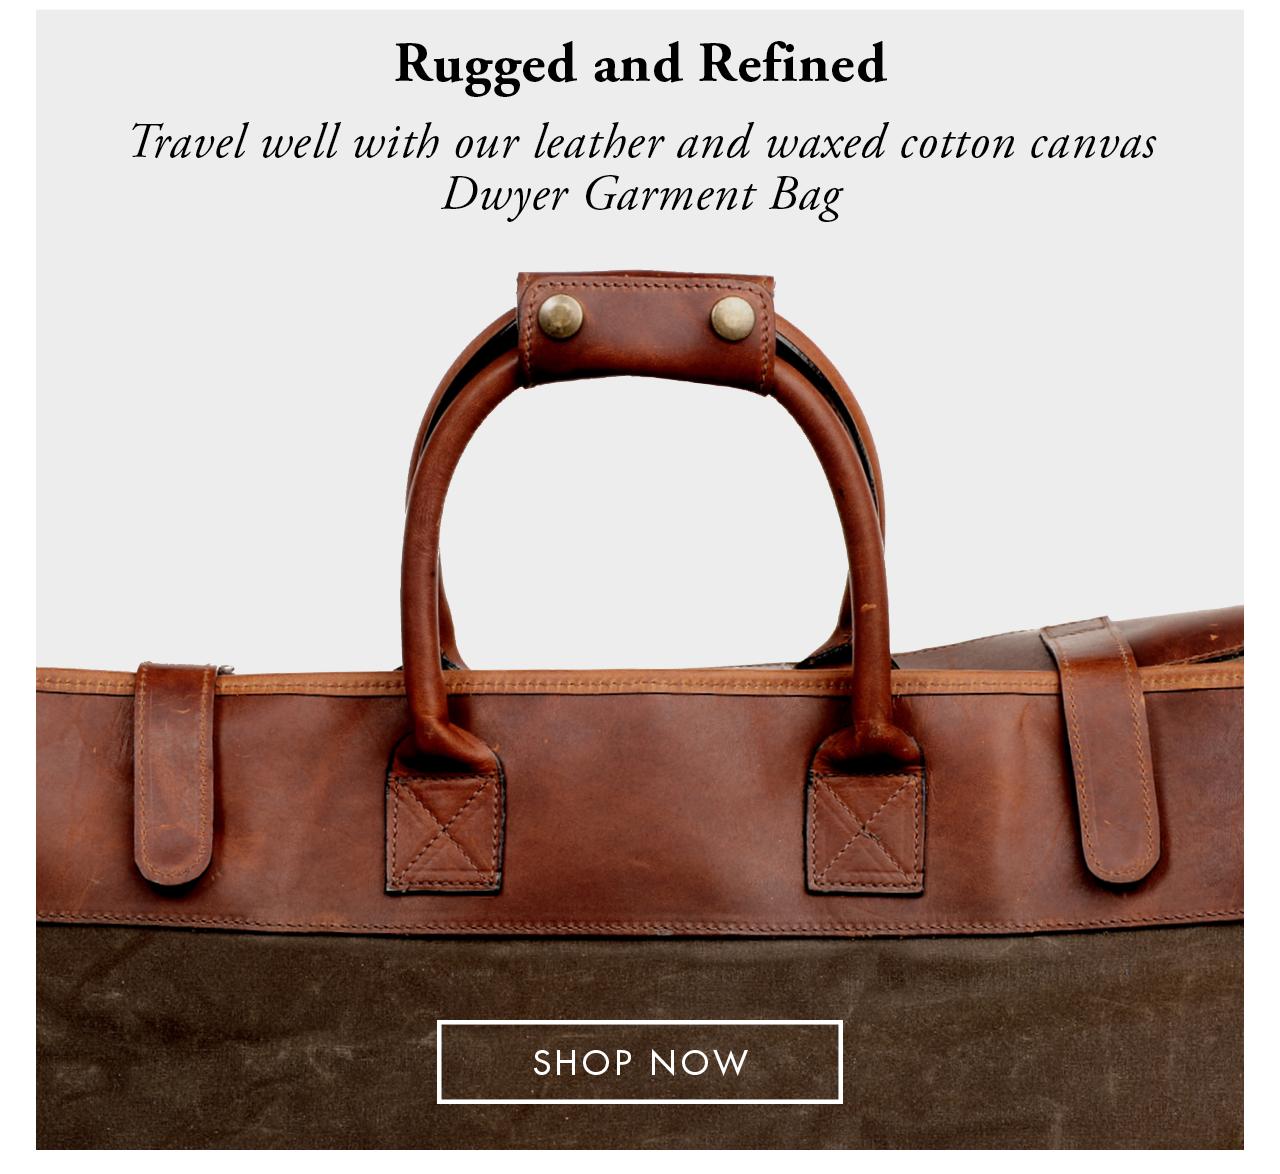 The Dwyer Garment Bag